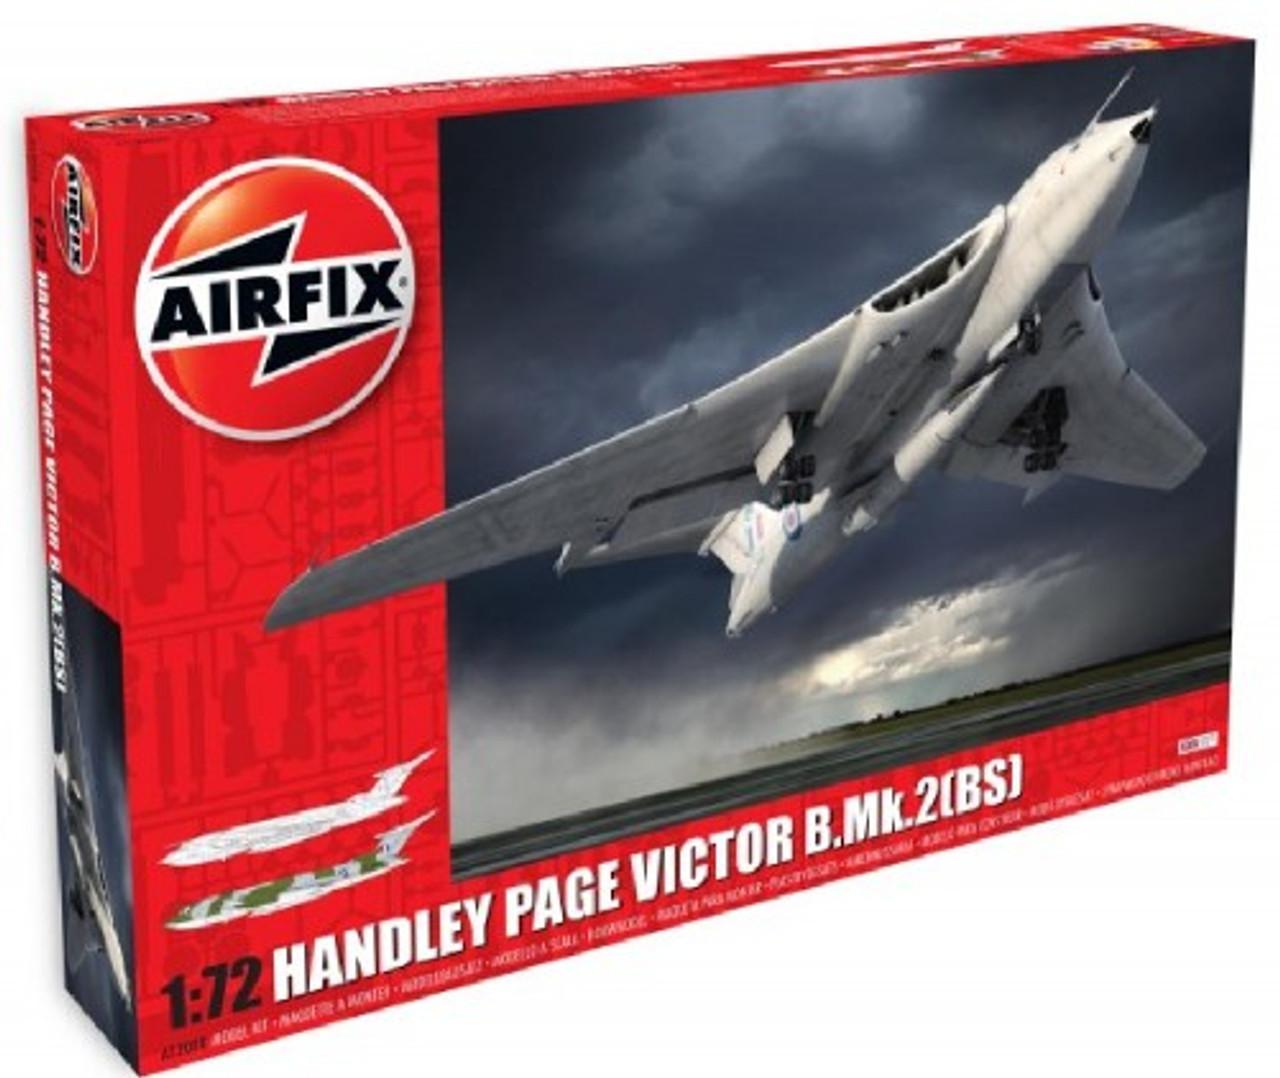 ARX-12008  1/72 Handley Page Victor B MK 2 (BS) Jet Bomber